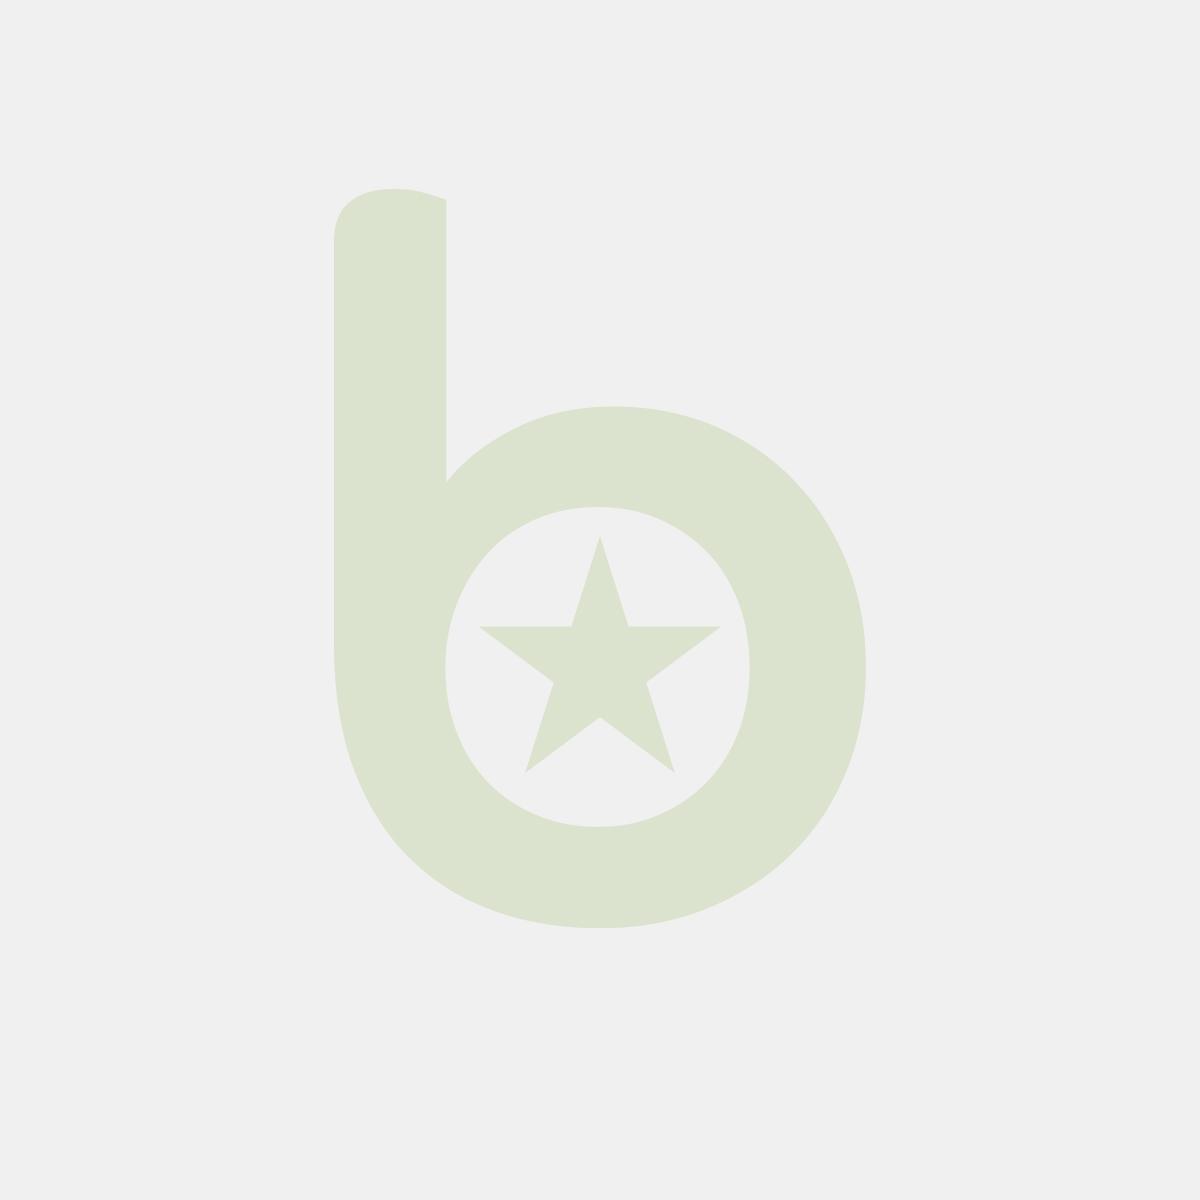 BA007 Gaśnica 100x100mm płyta TD SYSTEM TOPLight S-tandard